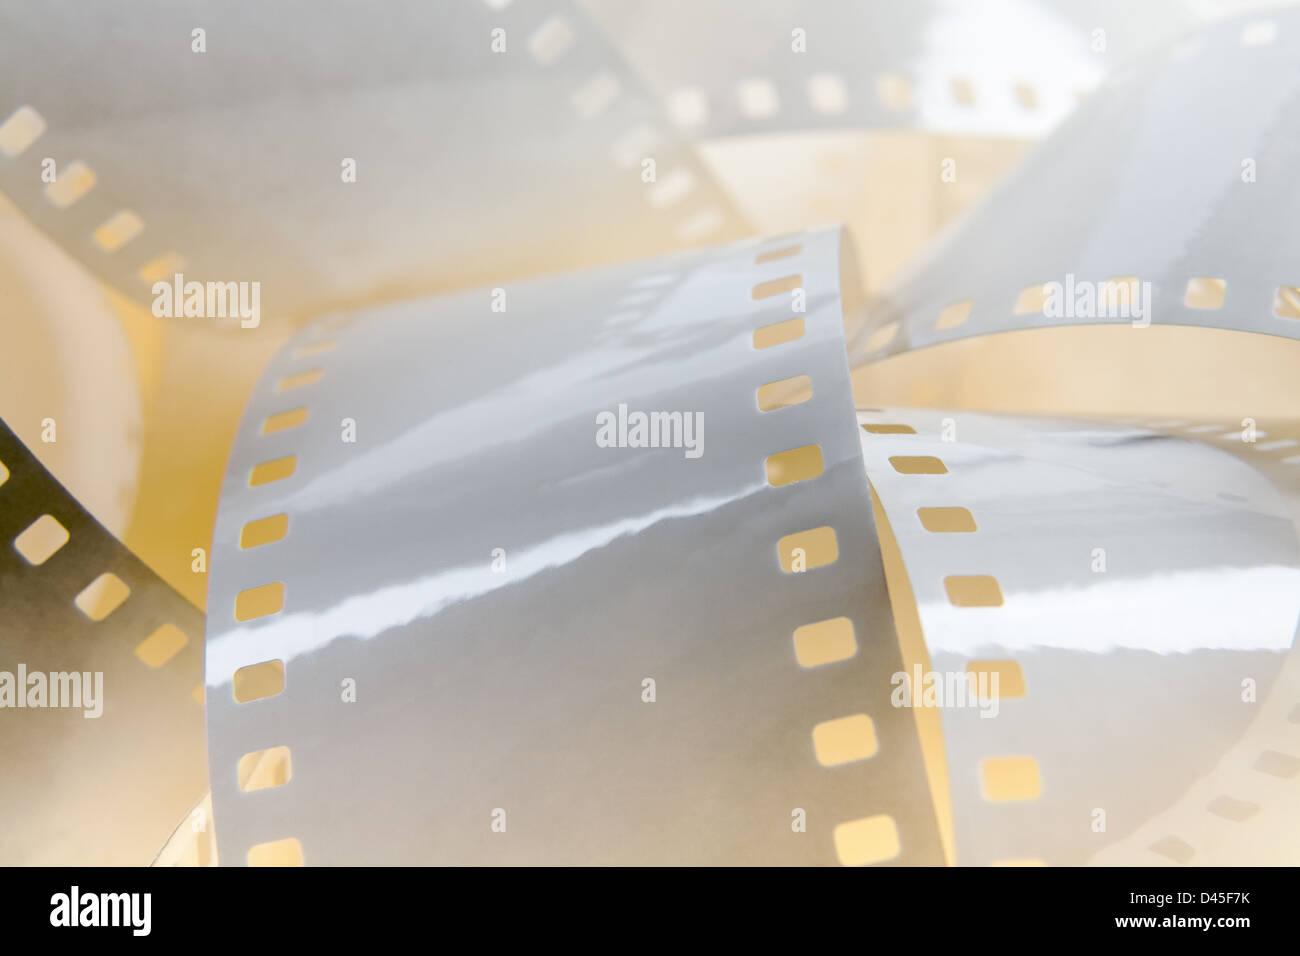 White film background - Stock Image